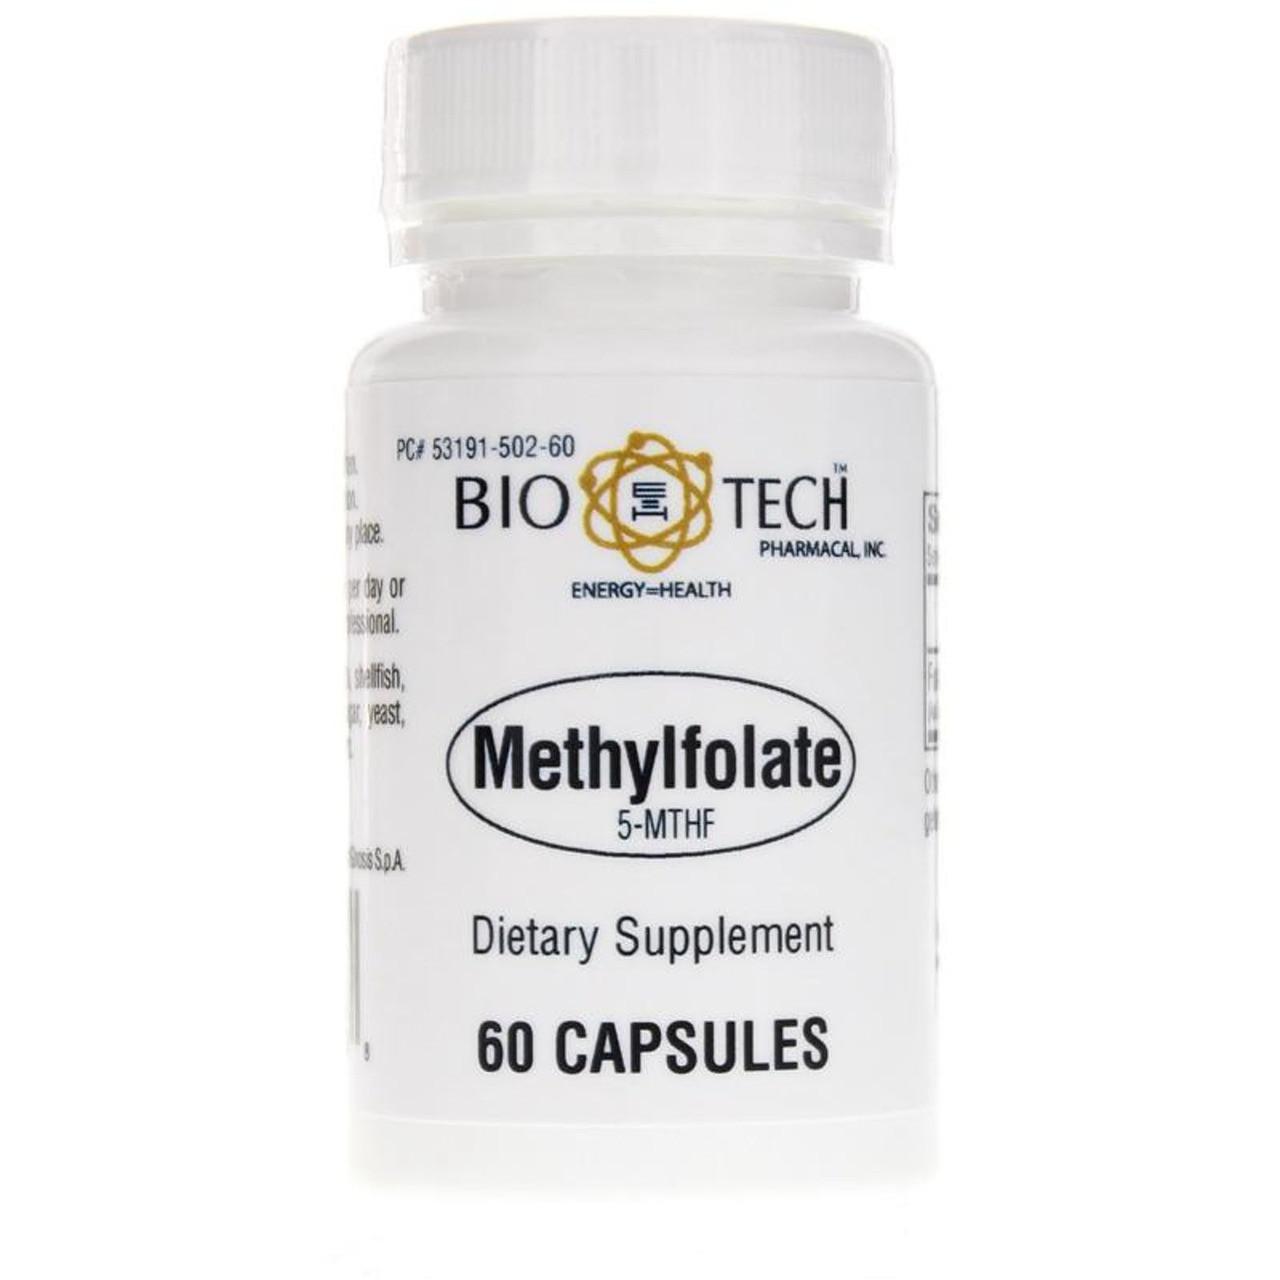 Bio-Tech Methylfolate 5-MTHF 60 caps